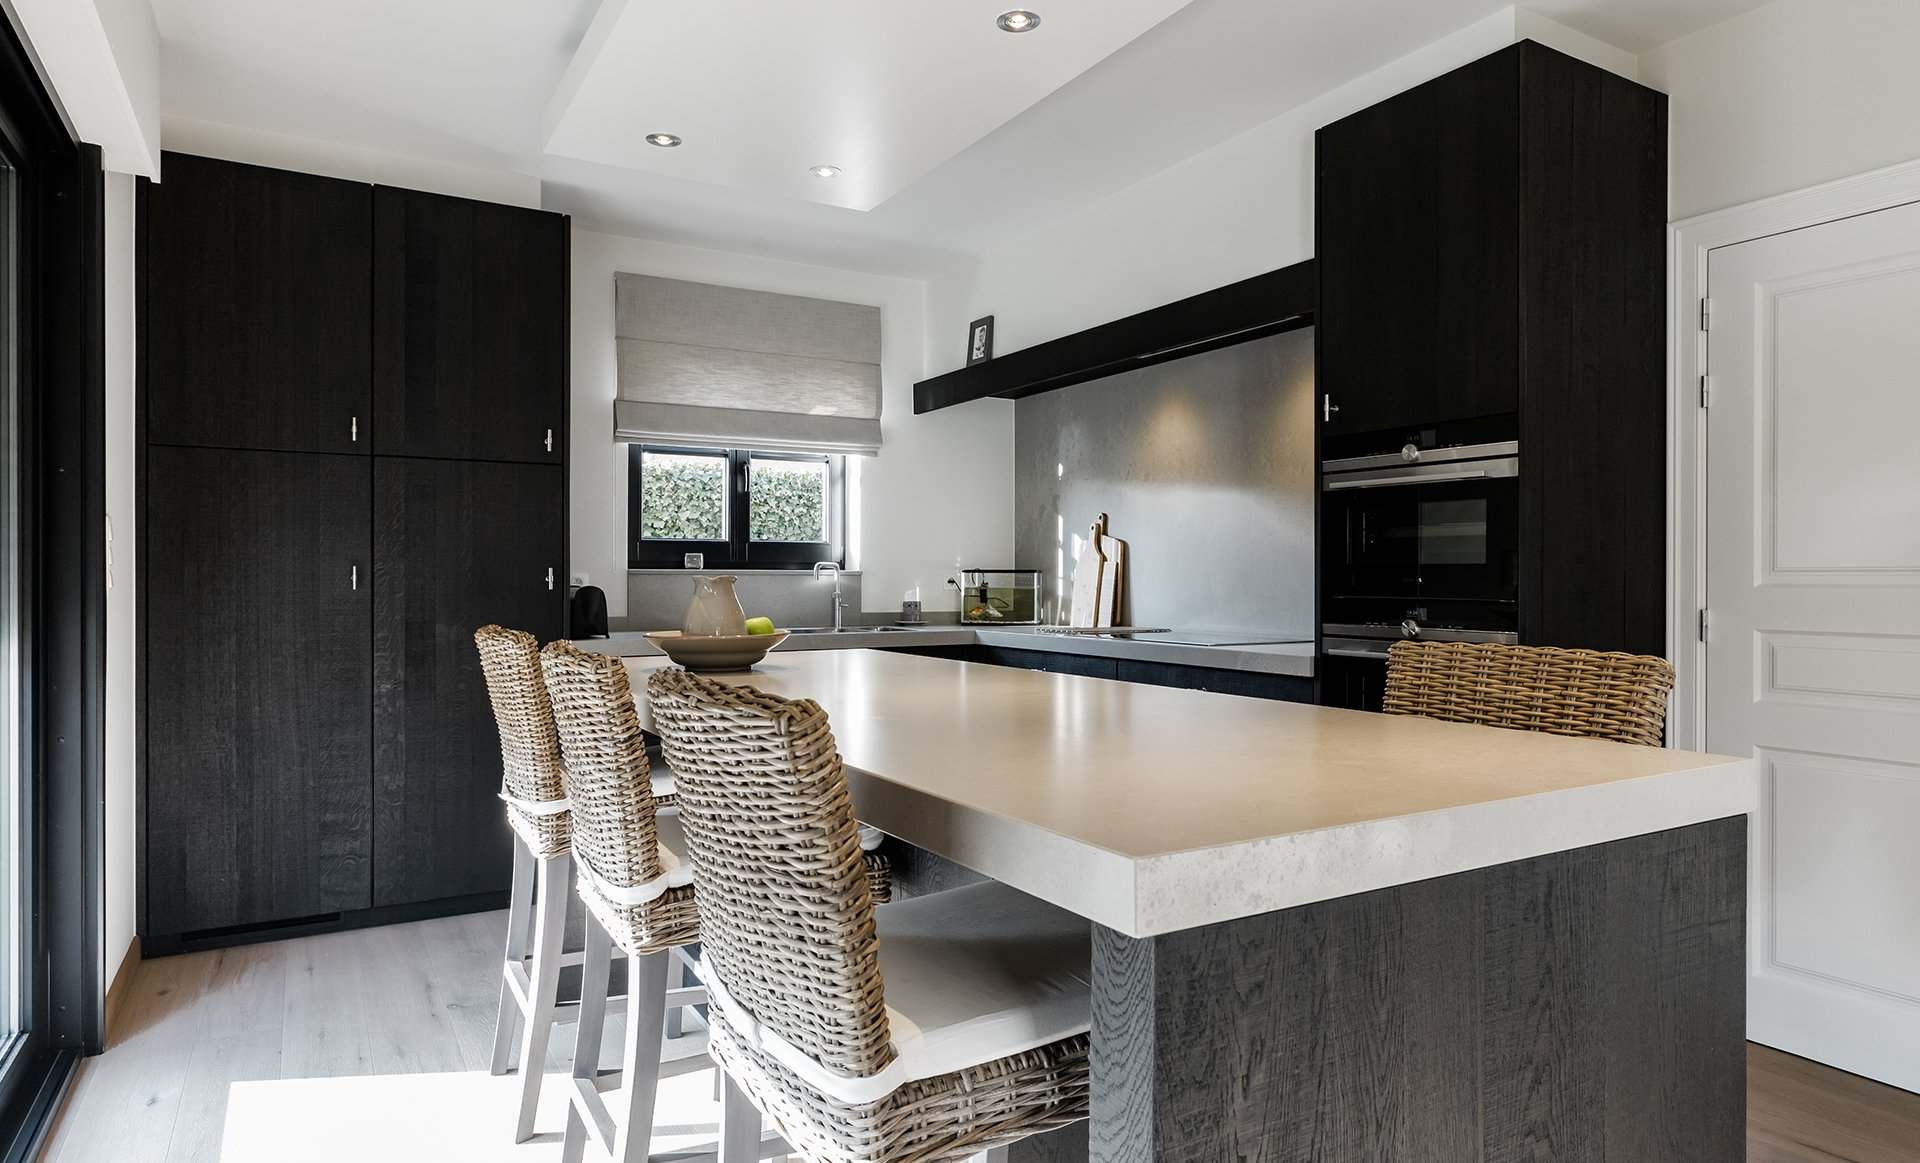 Home Design Keukens : G design: keukens & interieur op maat.